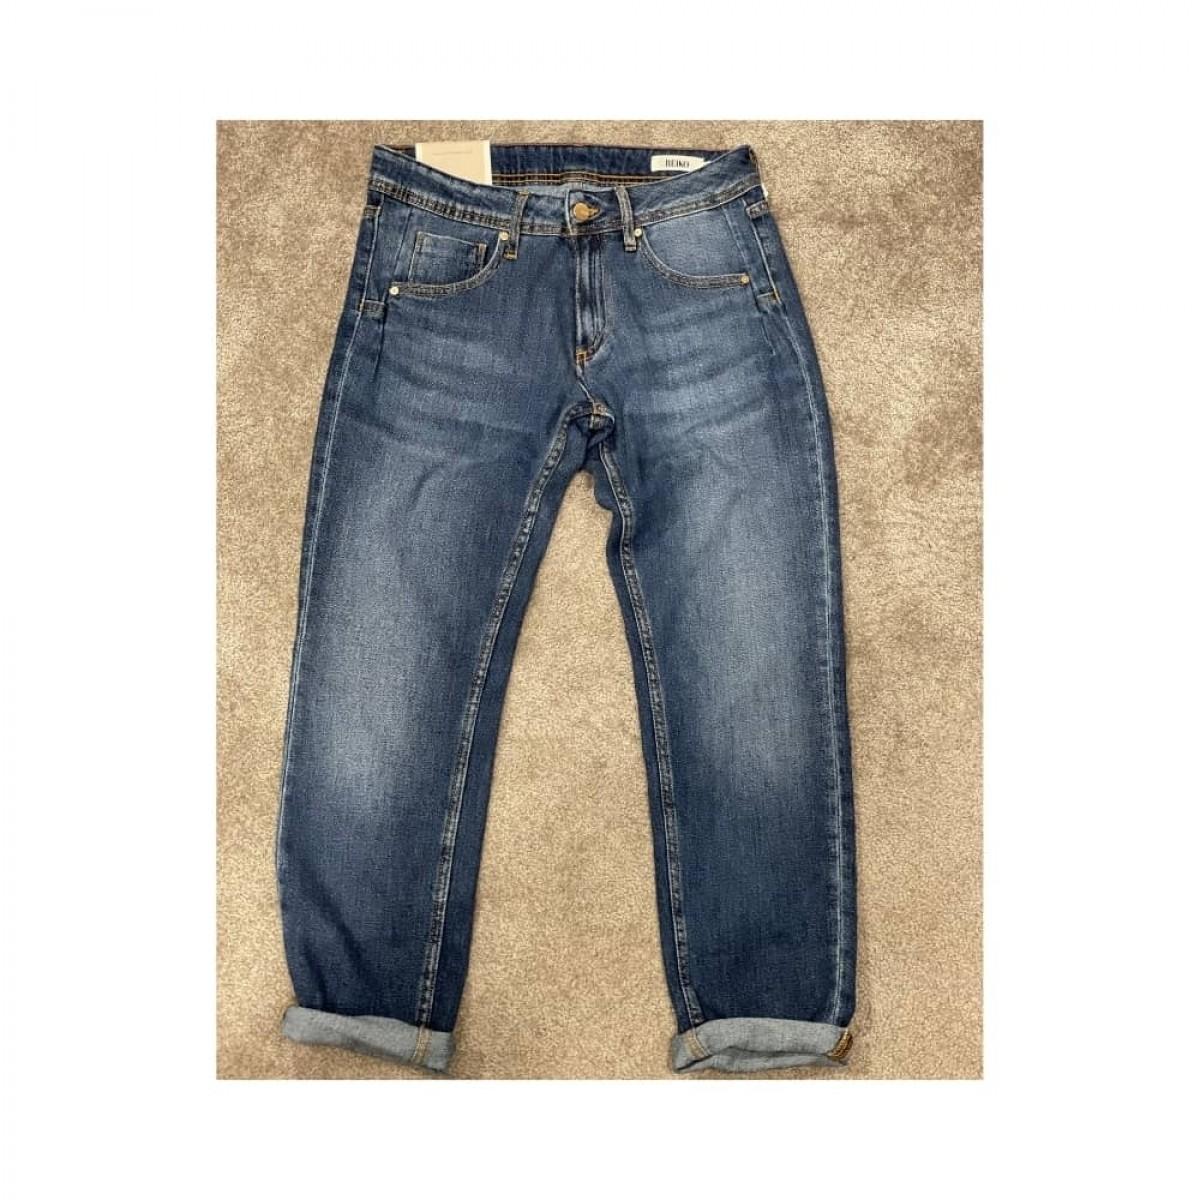 nina boyfriend jeans - denim blue - front